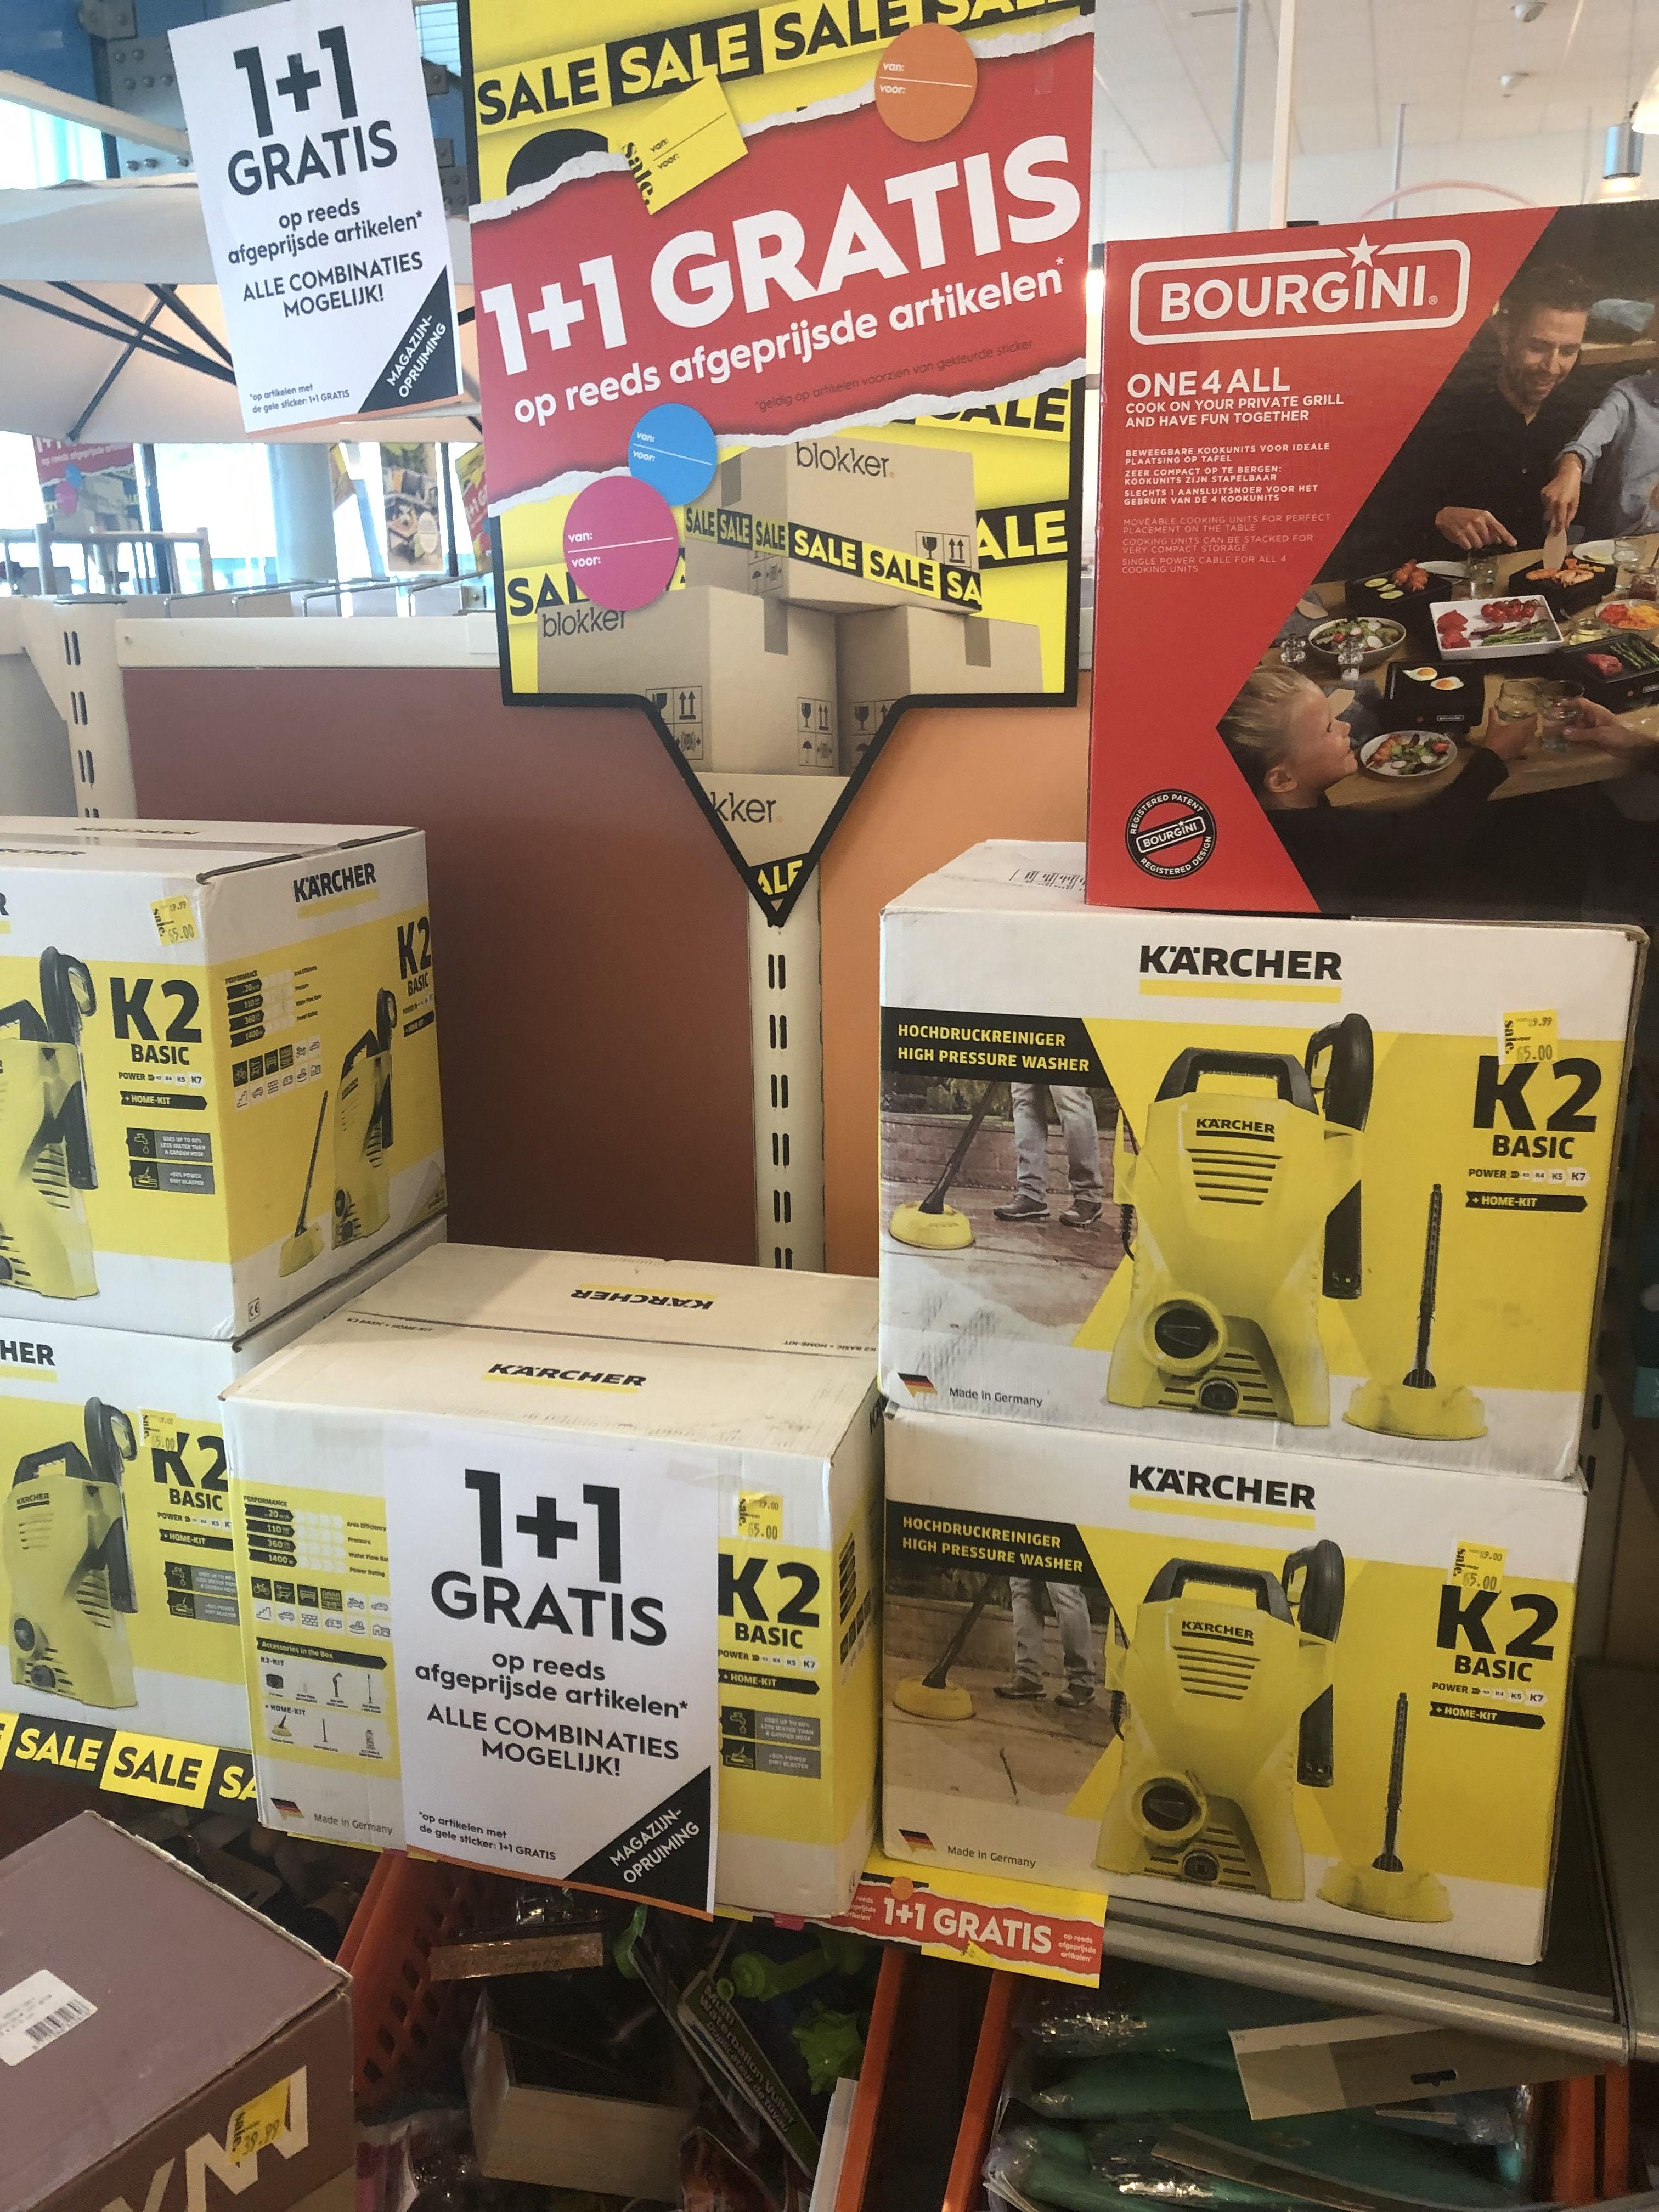 karcher K2 bij Blokker Maxis 1+1